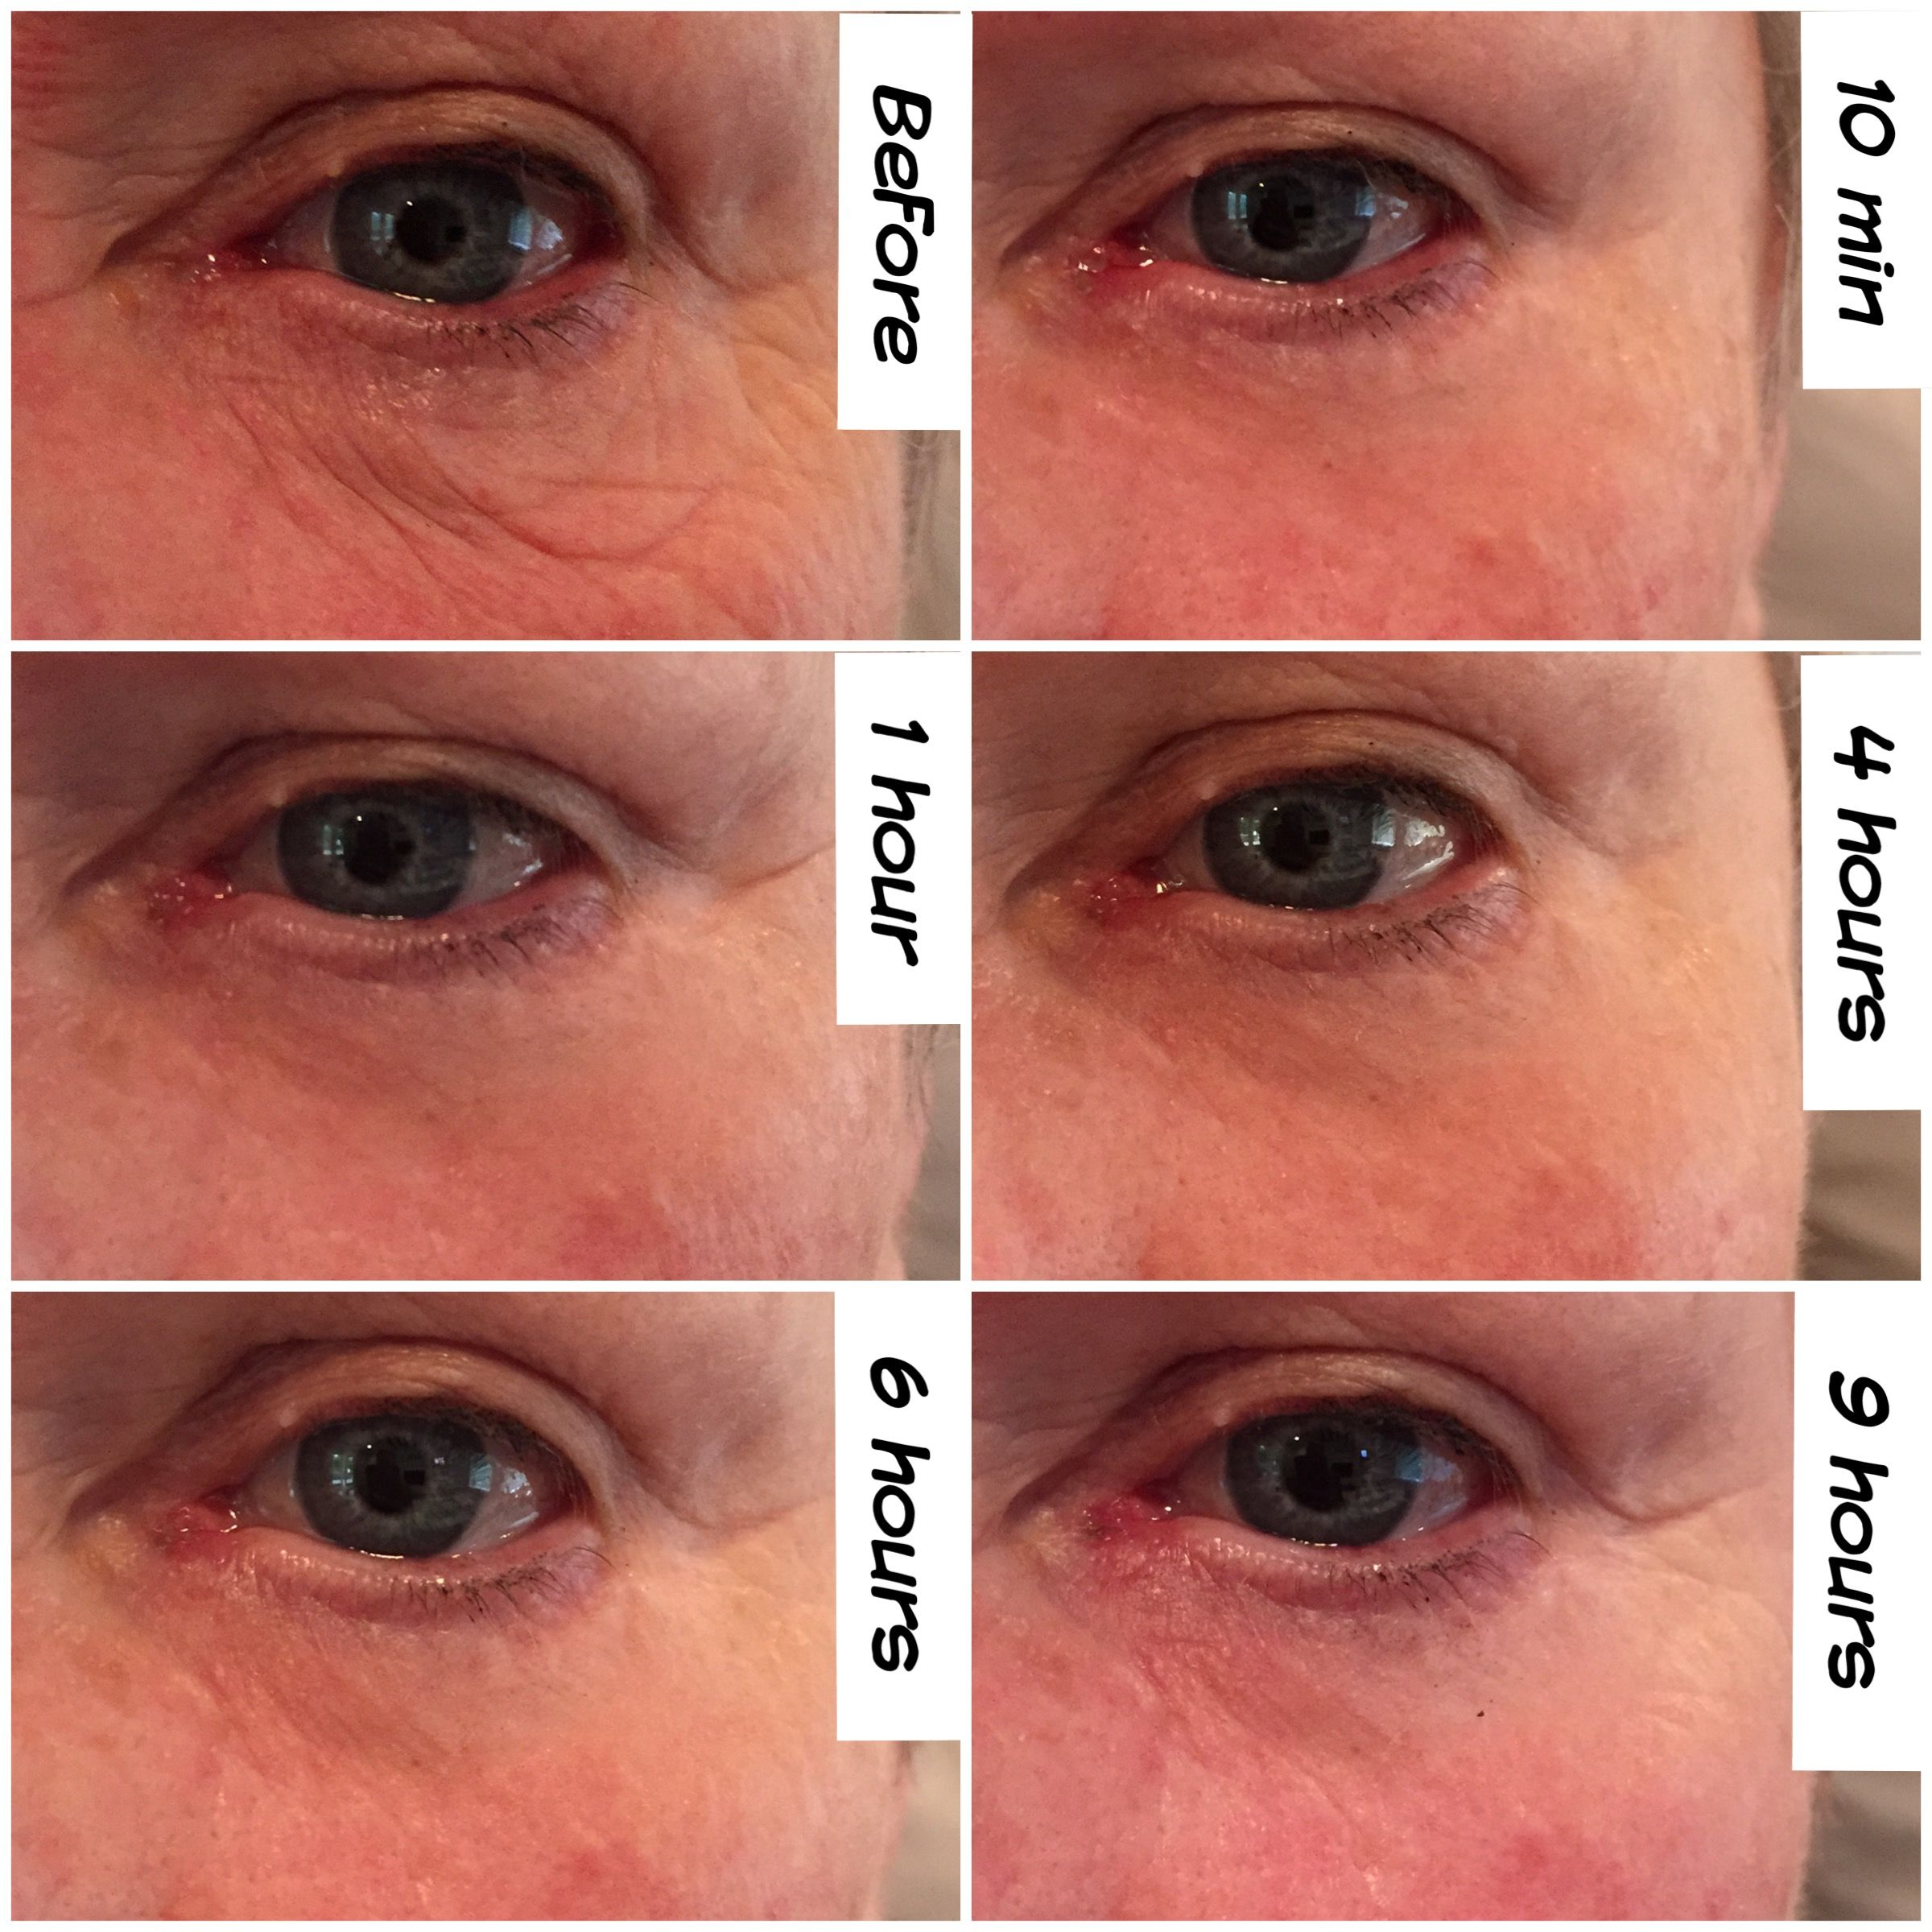 under eye wrinkle cream that really works